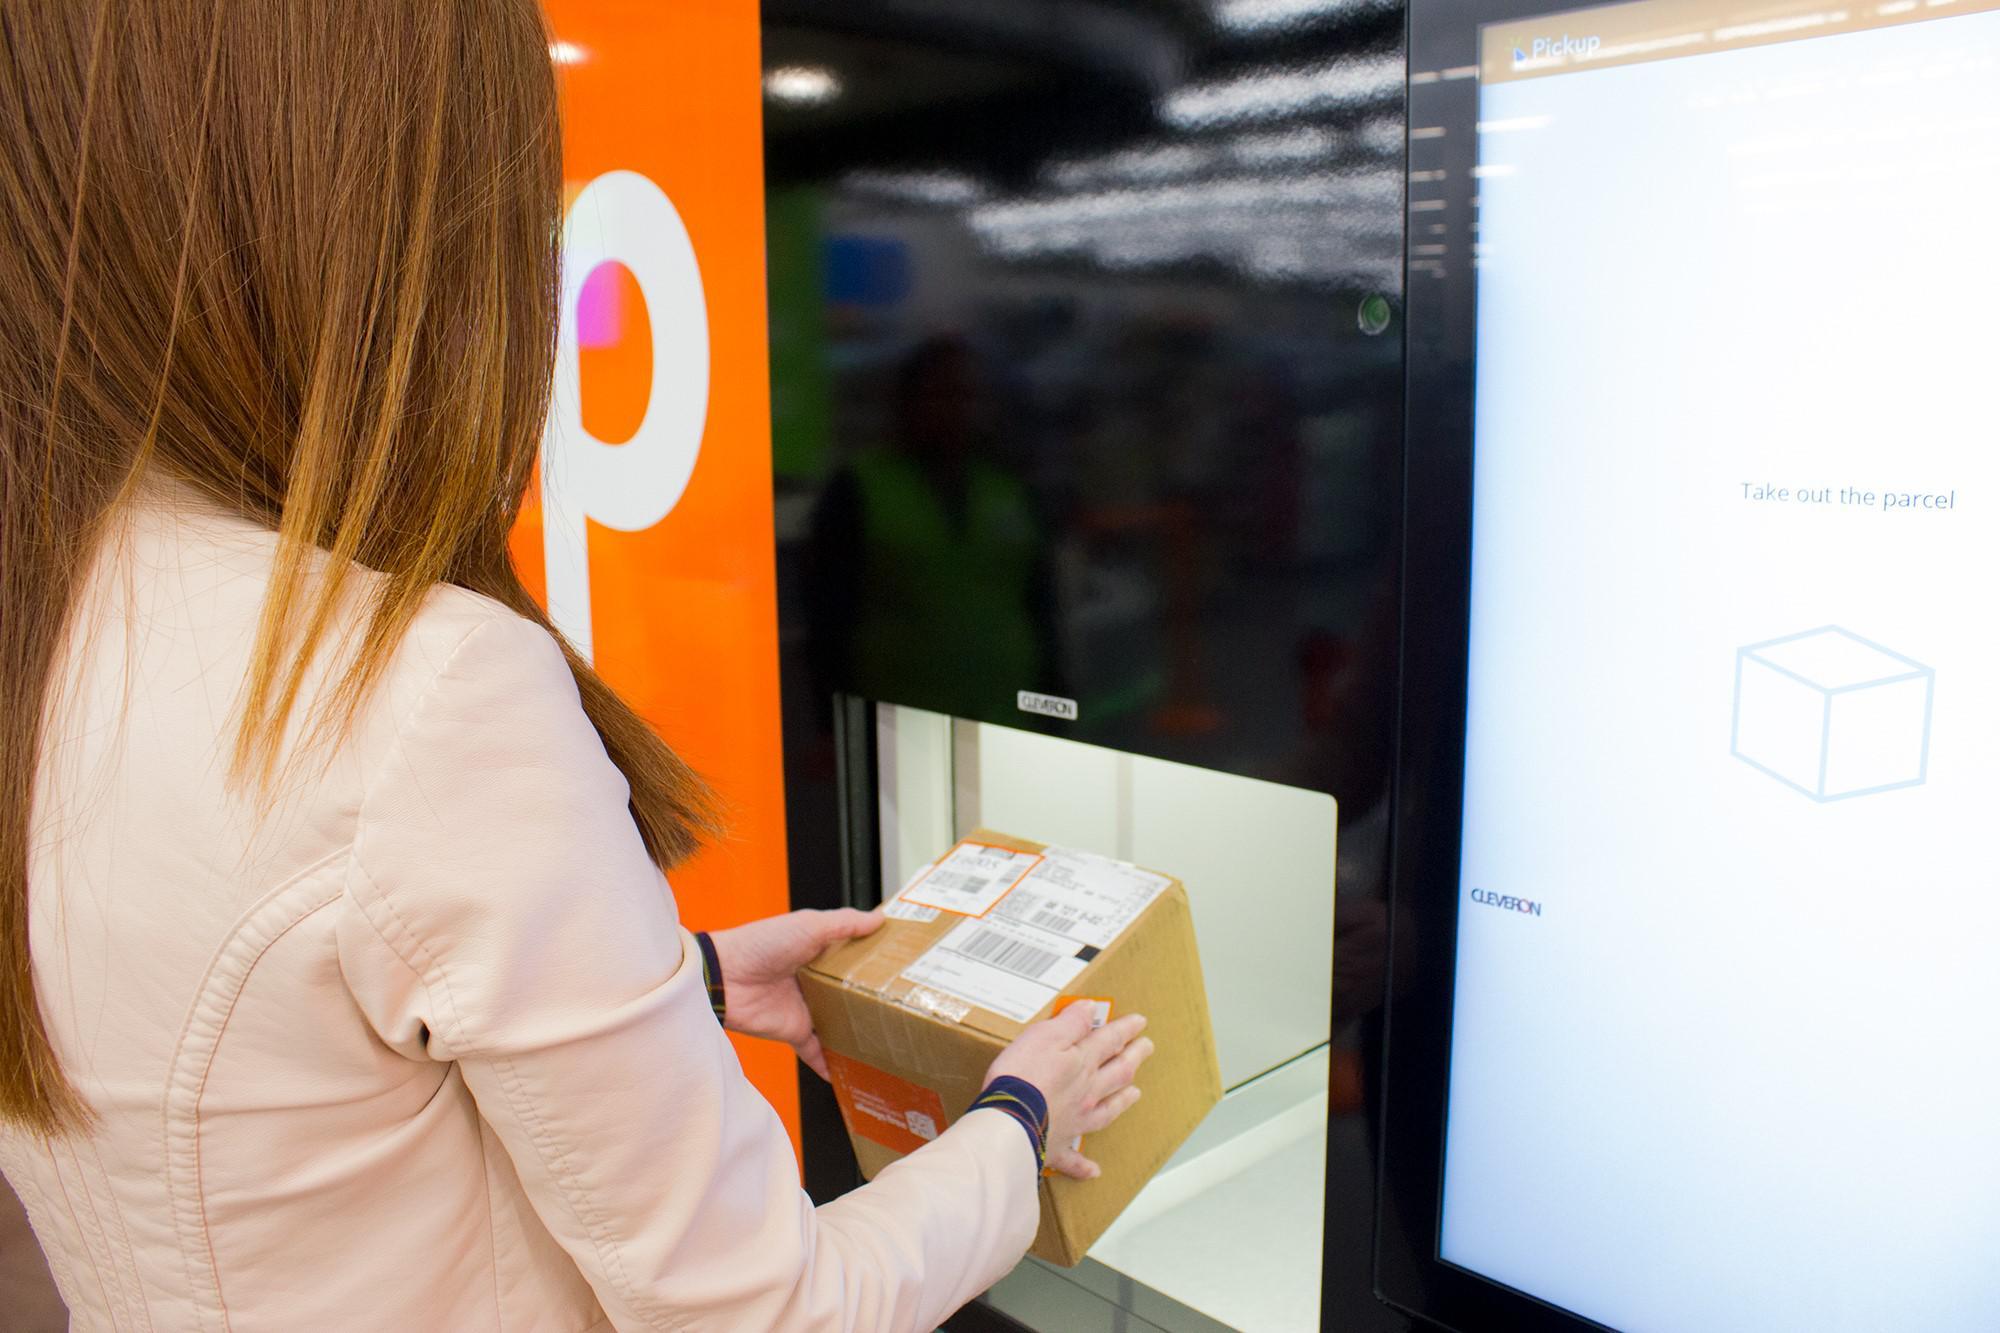 What's New: Walmart in West Orange gets upgrade